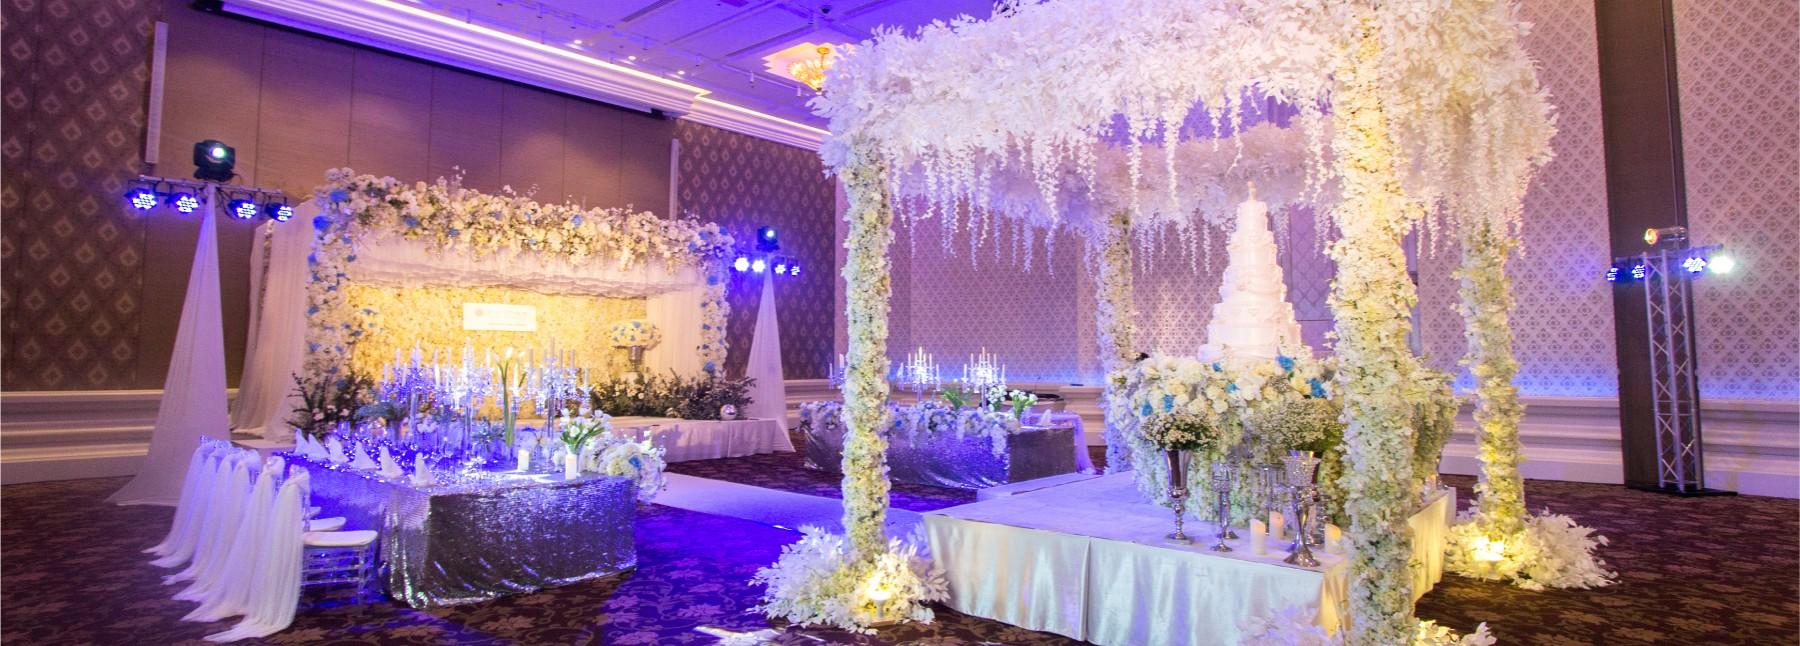 Bangkok hotel wedding packages pullman bangkok king power junglespirit Images